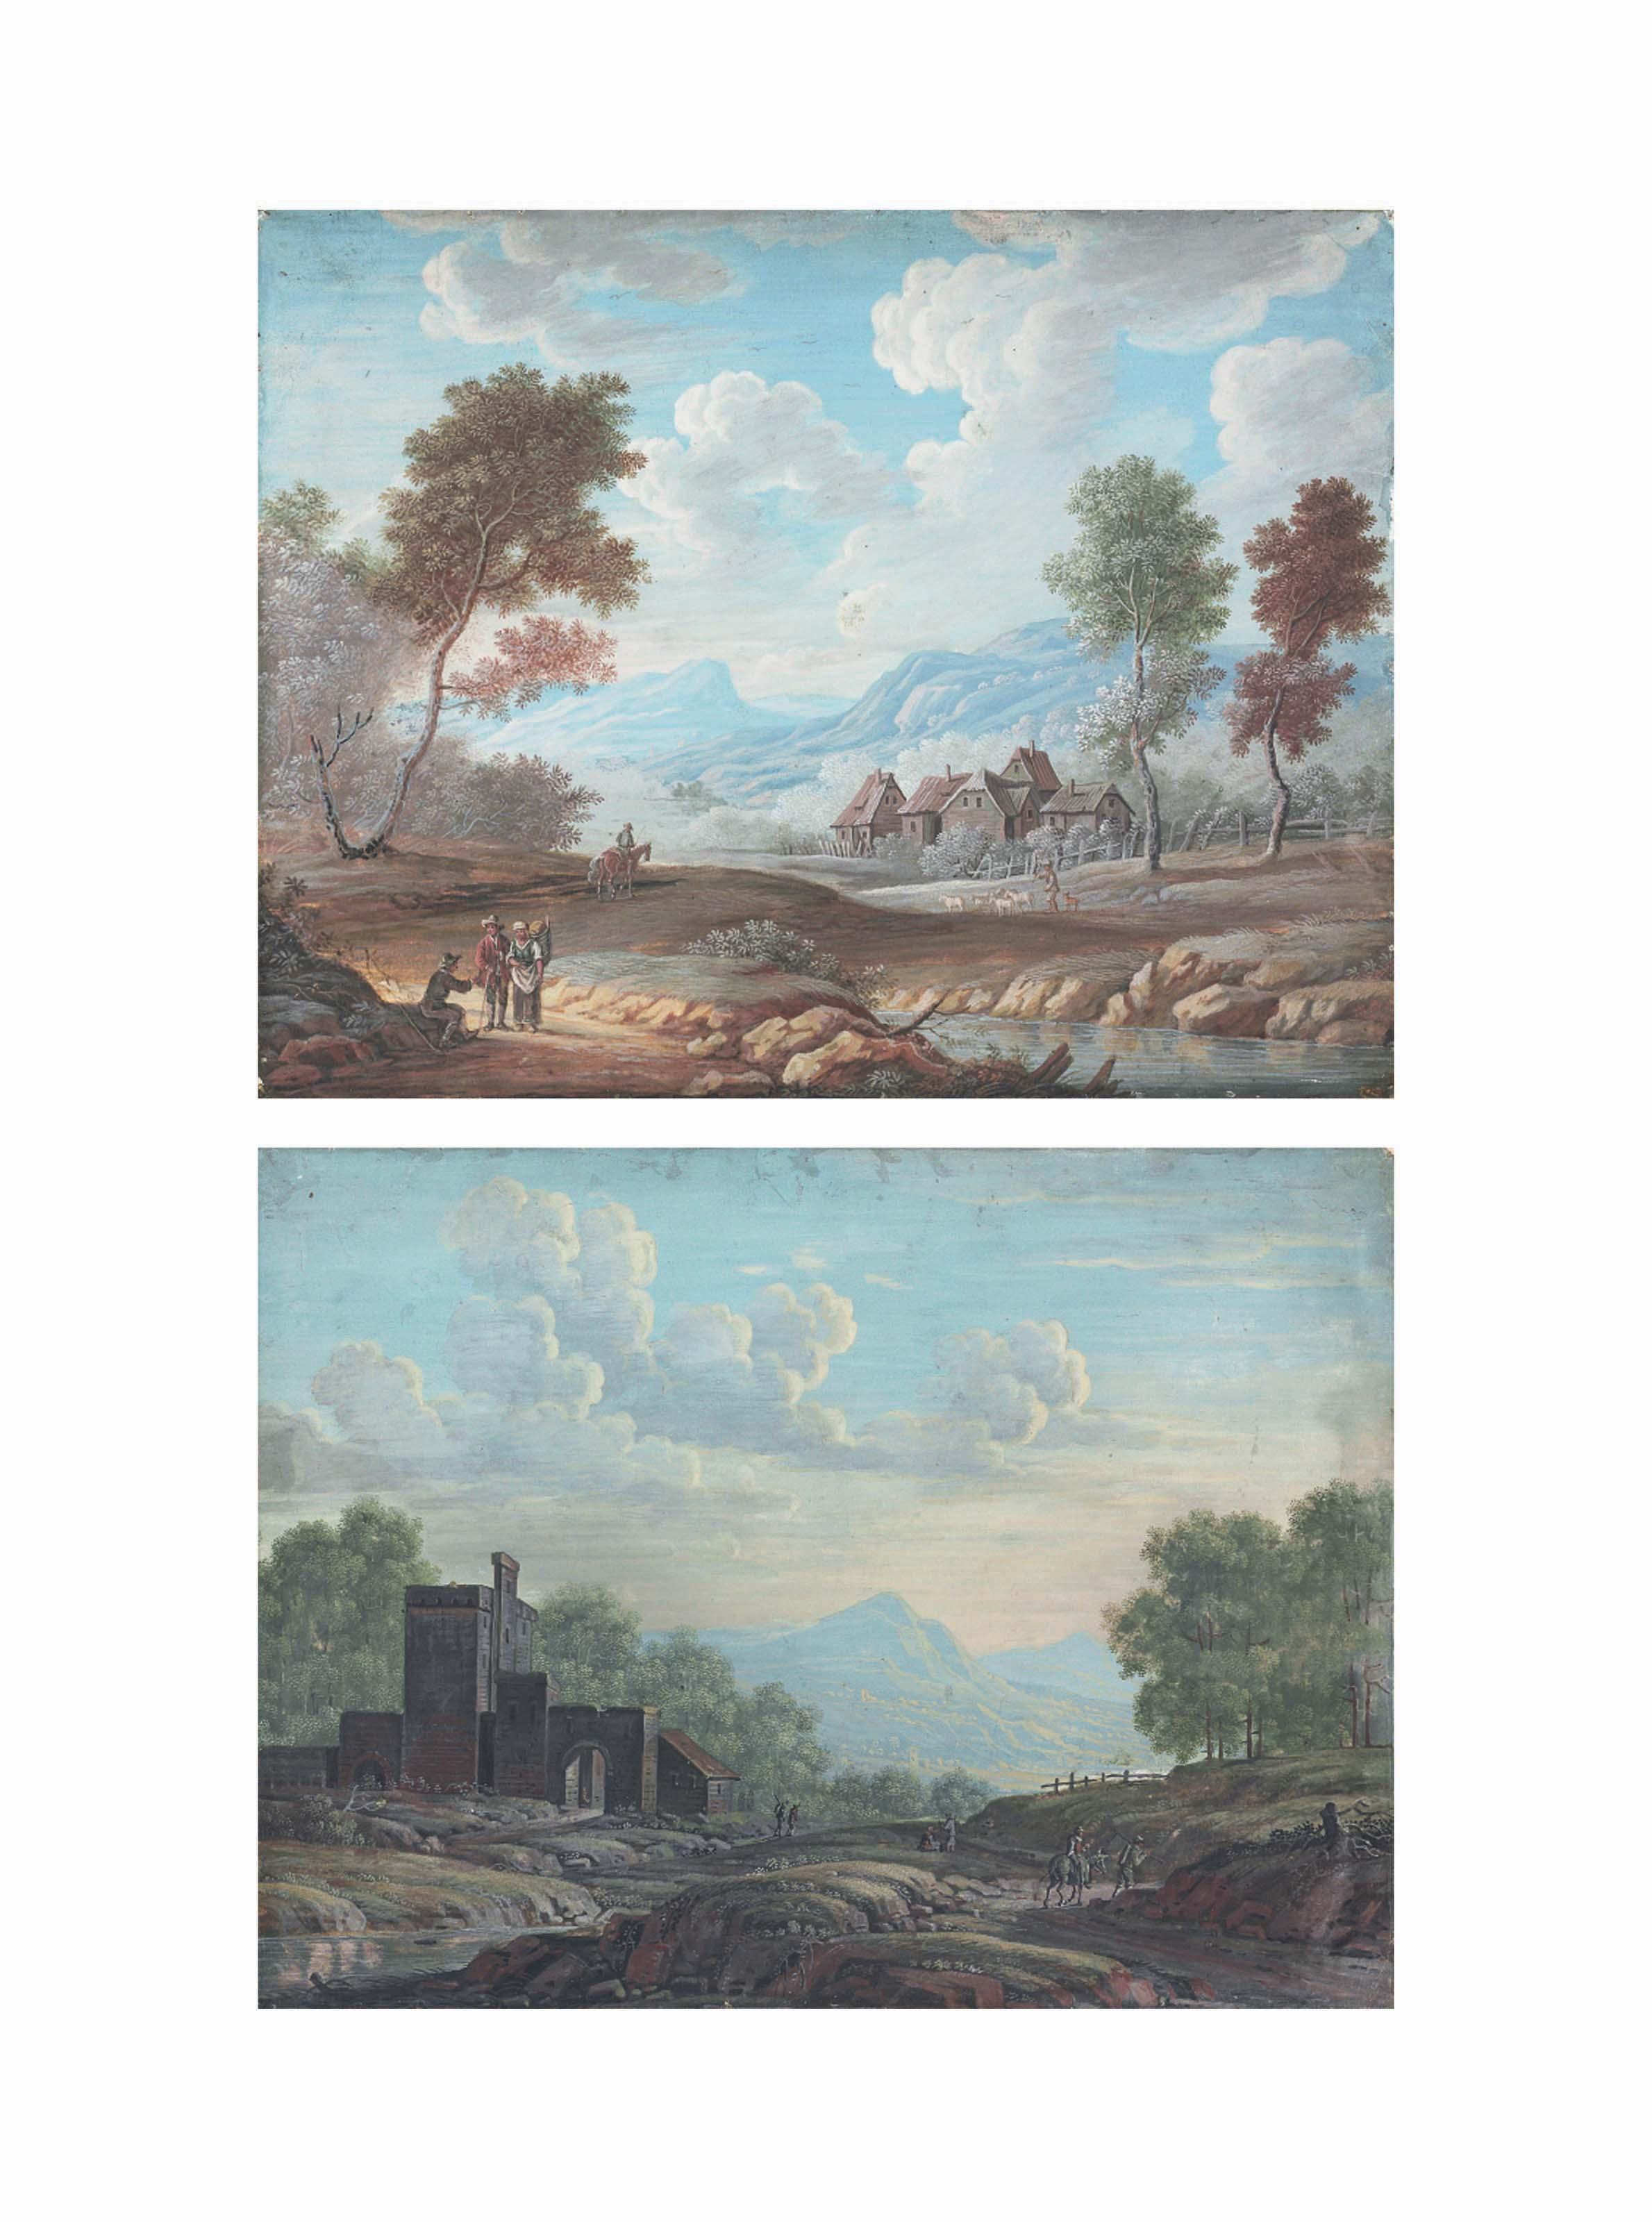 Henri-Desiré van Blarenberghe